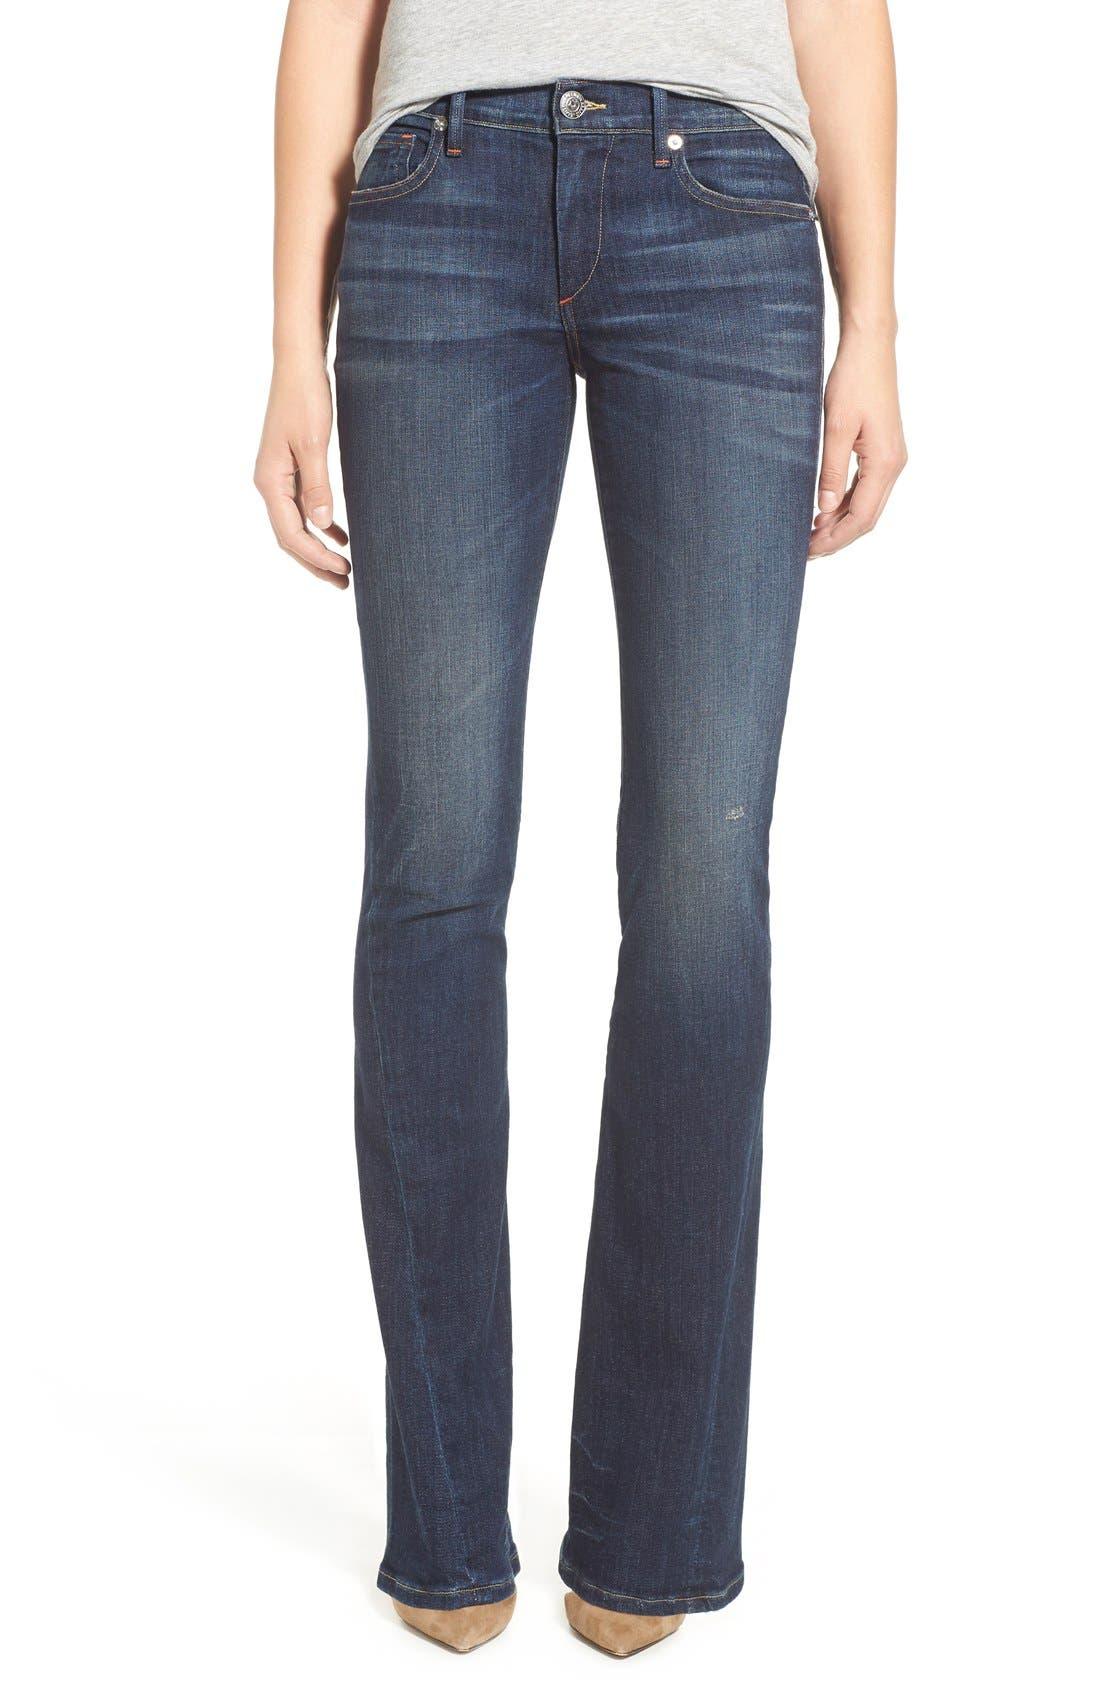 Main Image - True Religion Brand Jeans 'Becca' Twisted Seam Bootcut Jeans (Boyfriend Wash)